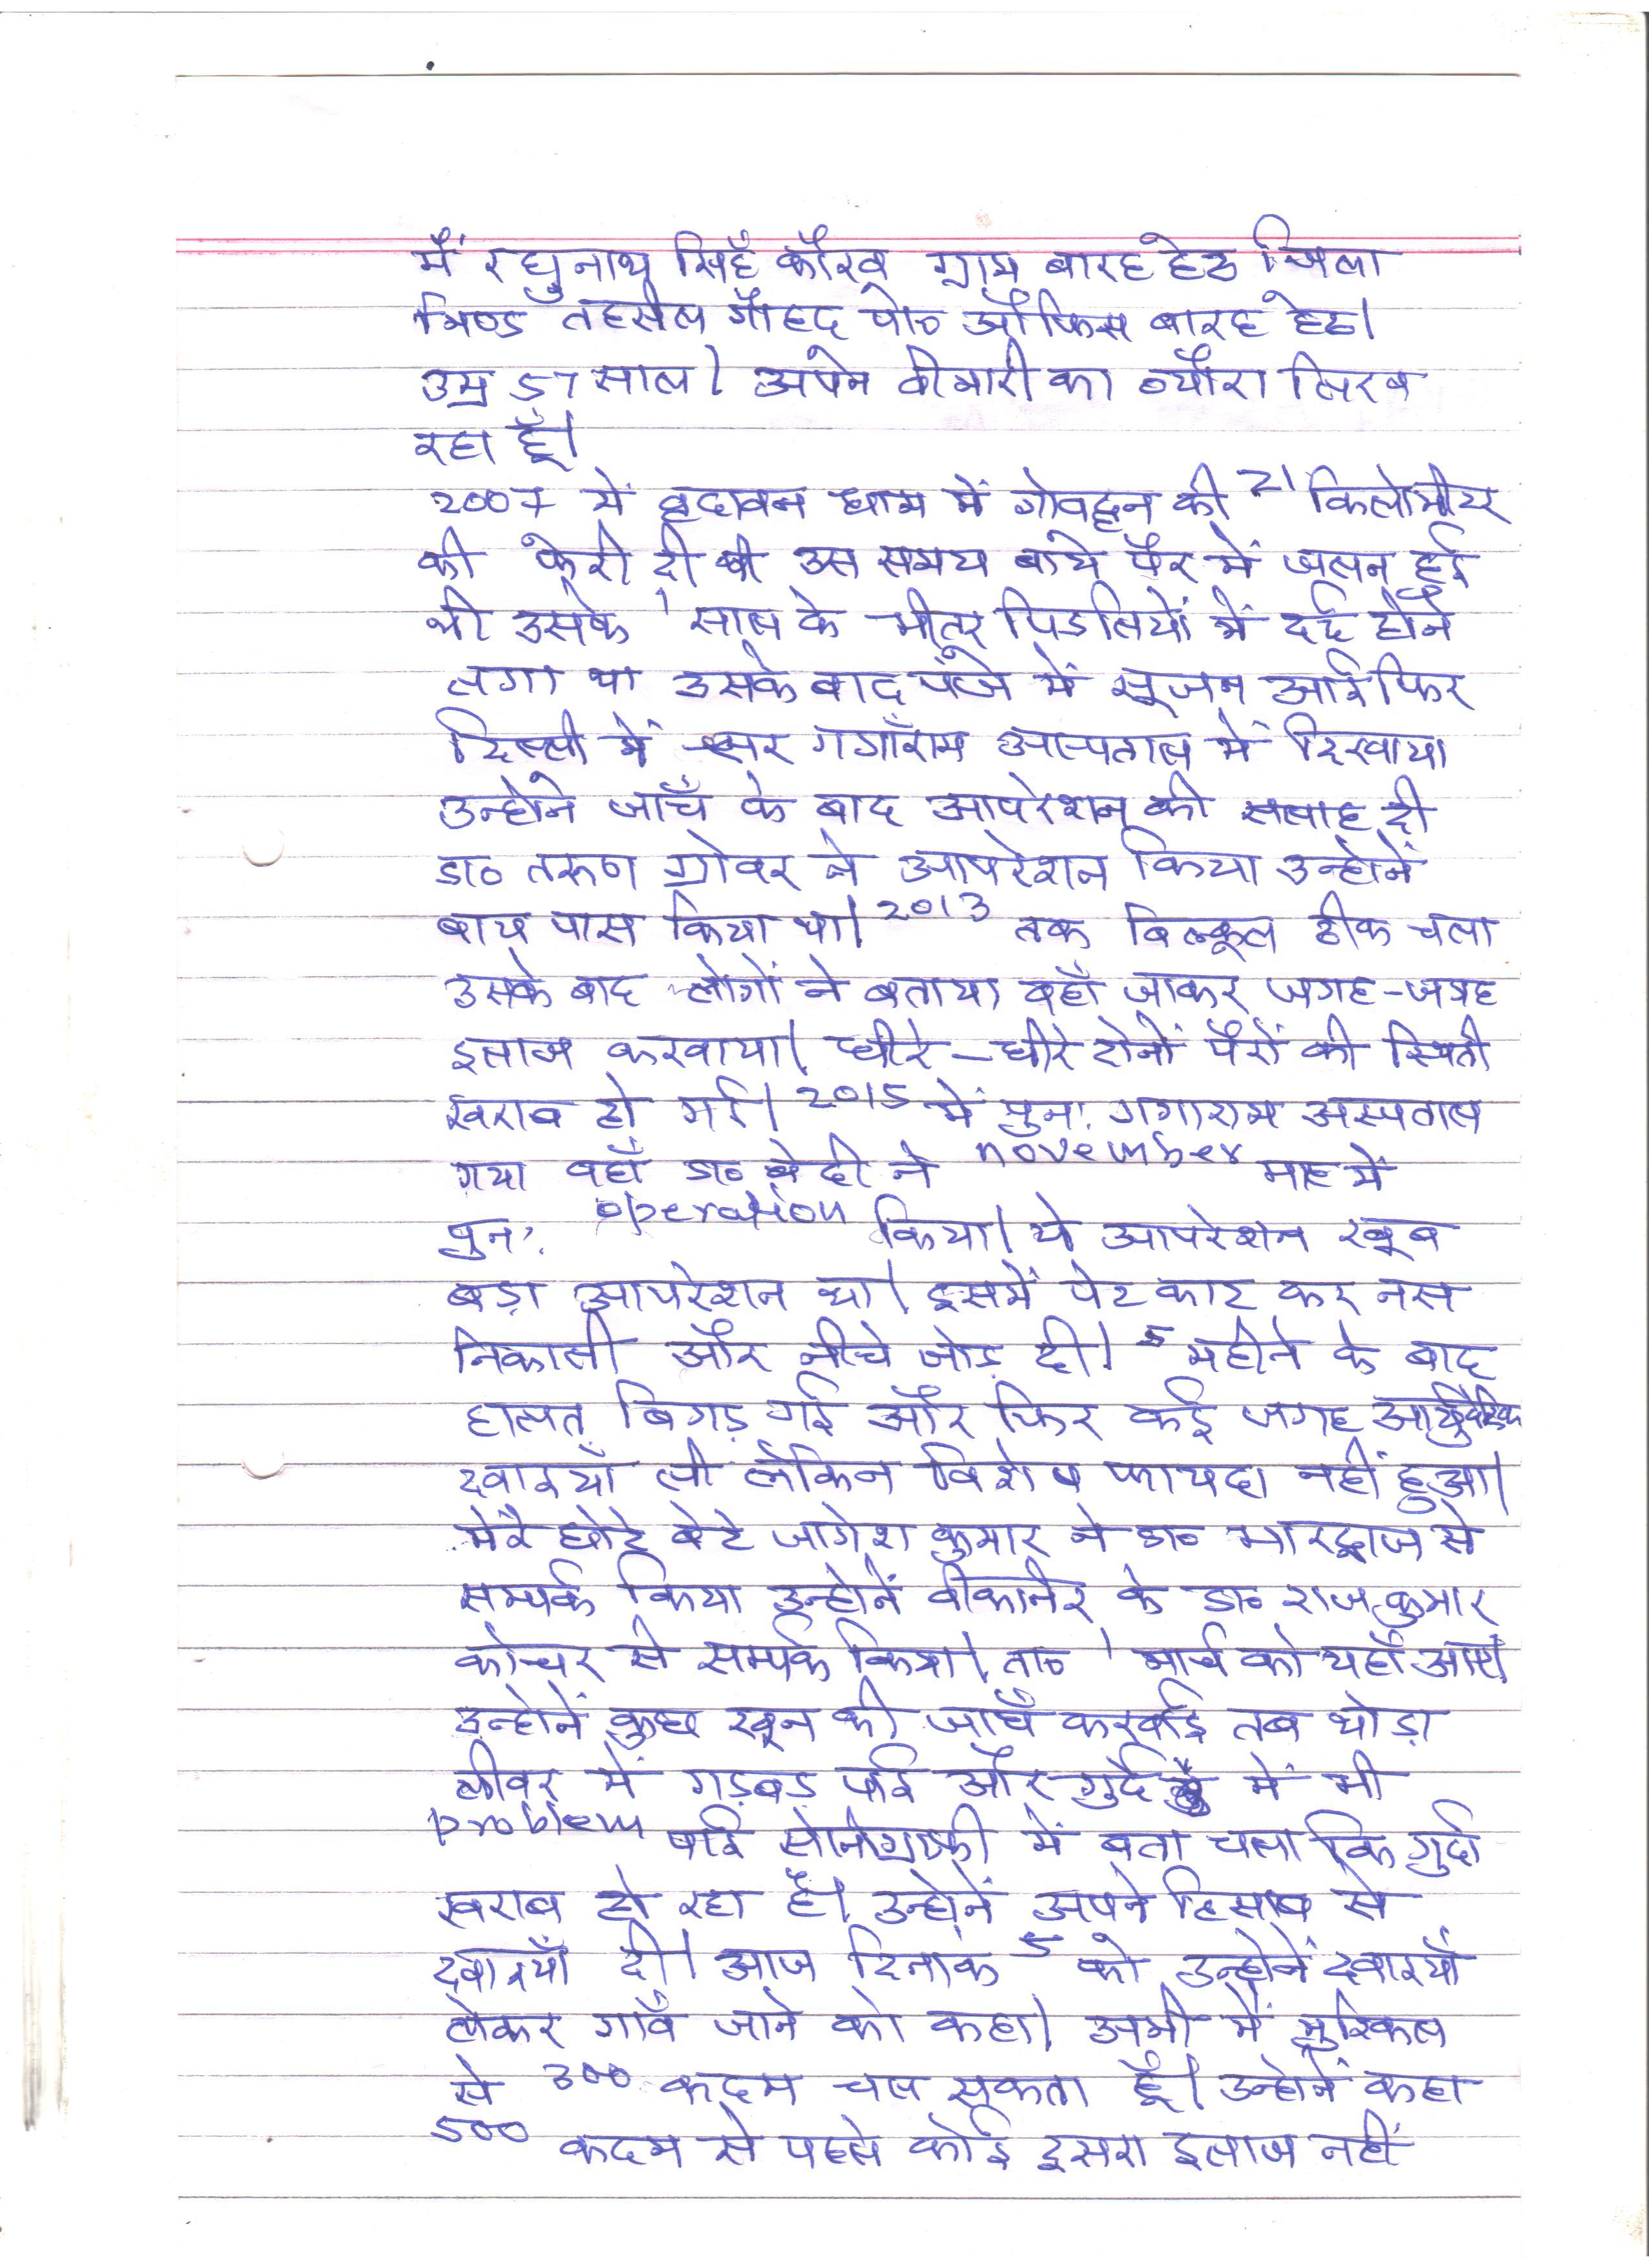 RAGHUNATH-SINGH-KAURAV-57-Yrs-DVT-treatment-20